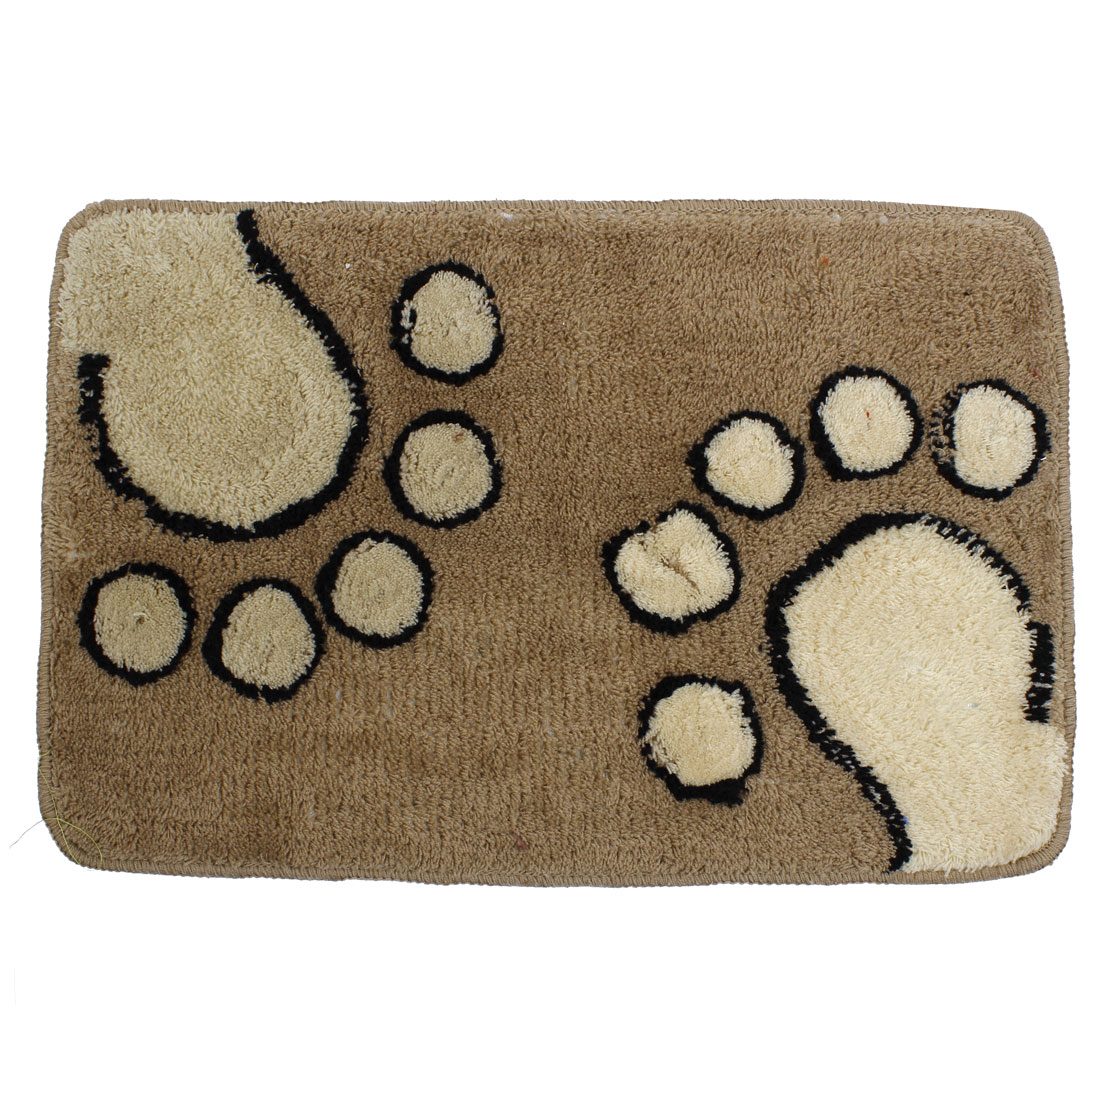 Light Brown Footprints Kitchen Floor Mat Area Rug Carpet 60cm x 40cm